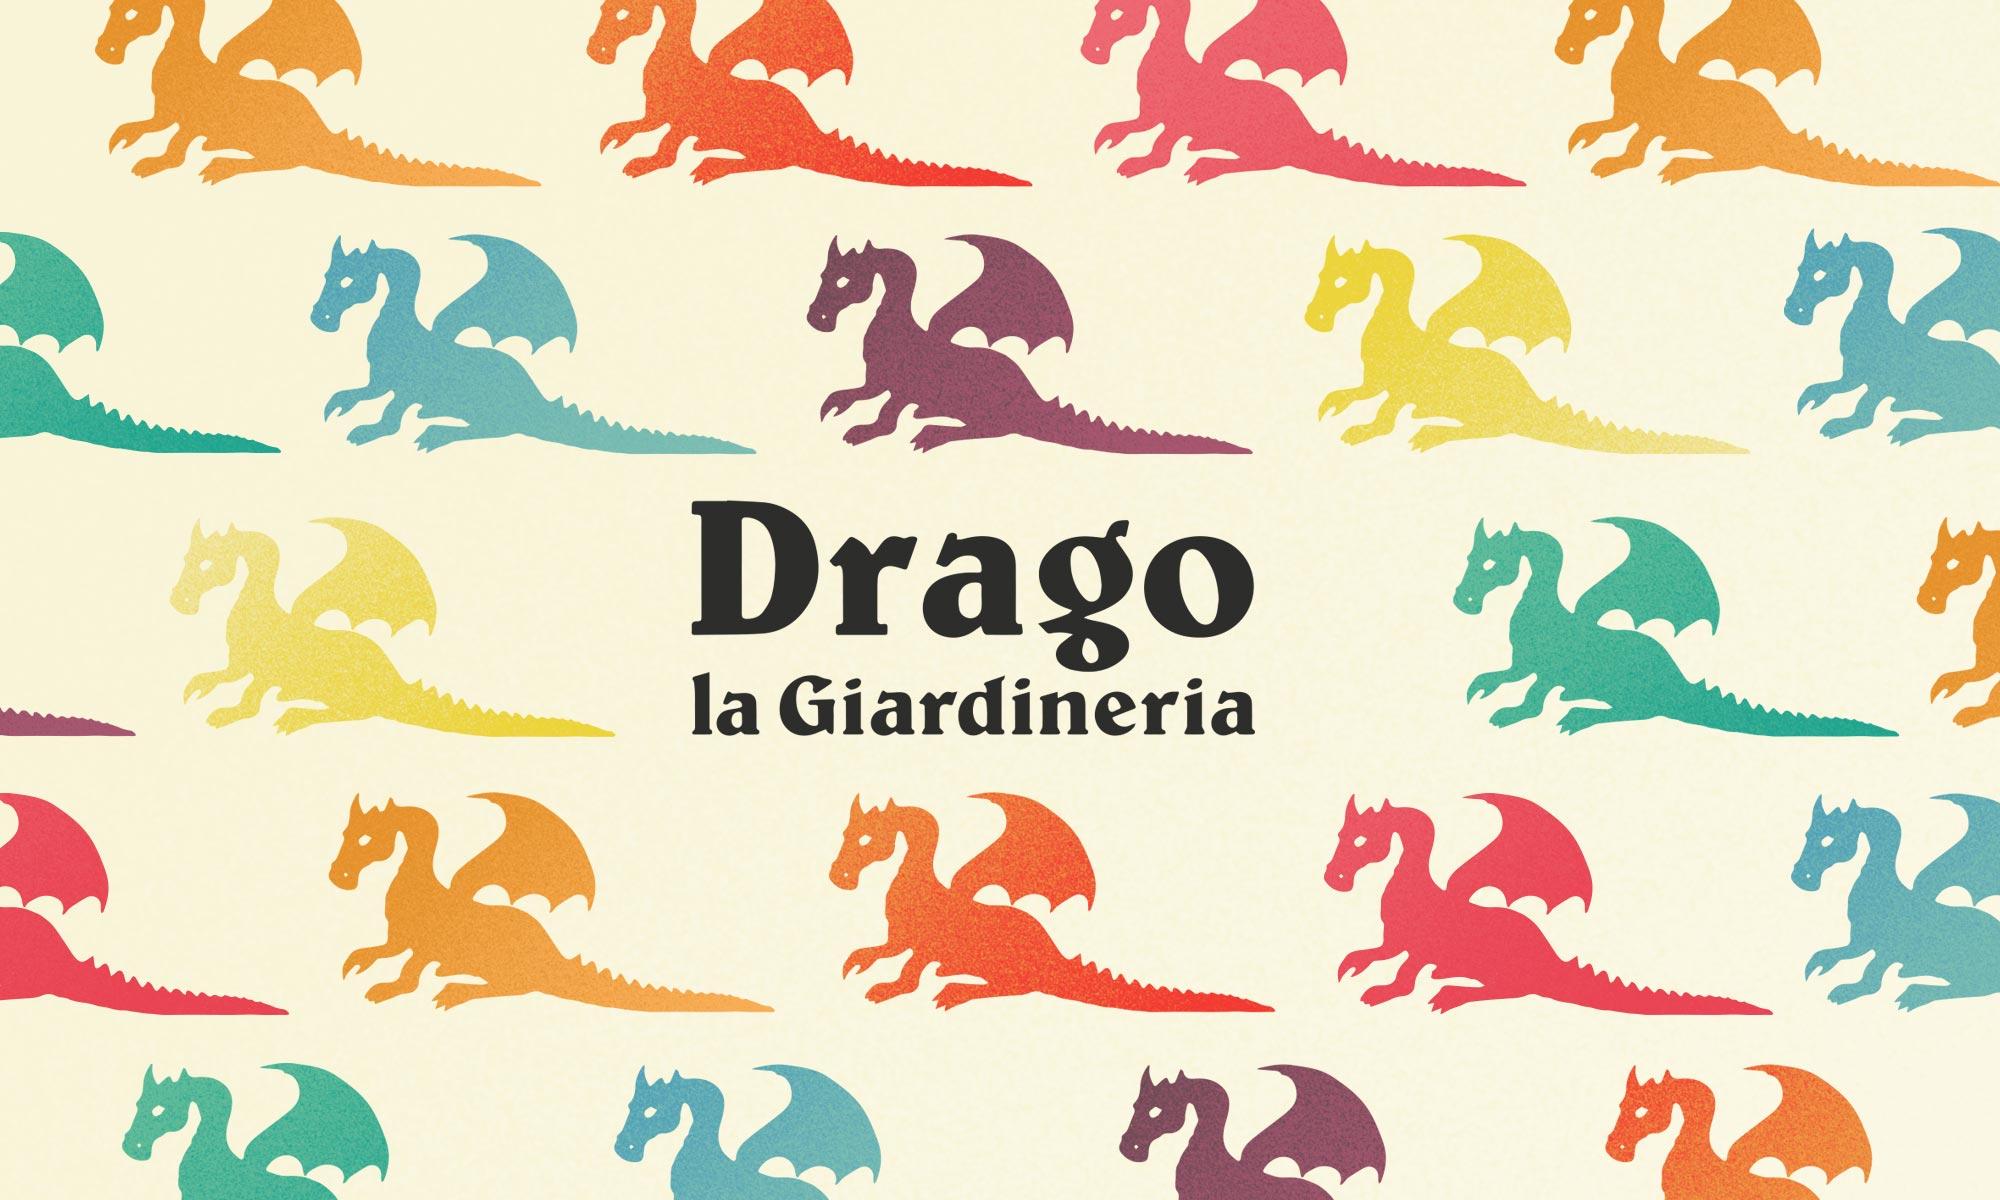 Giardineria Drago